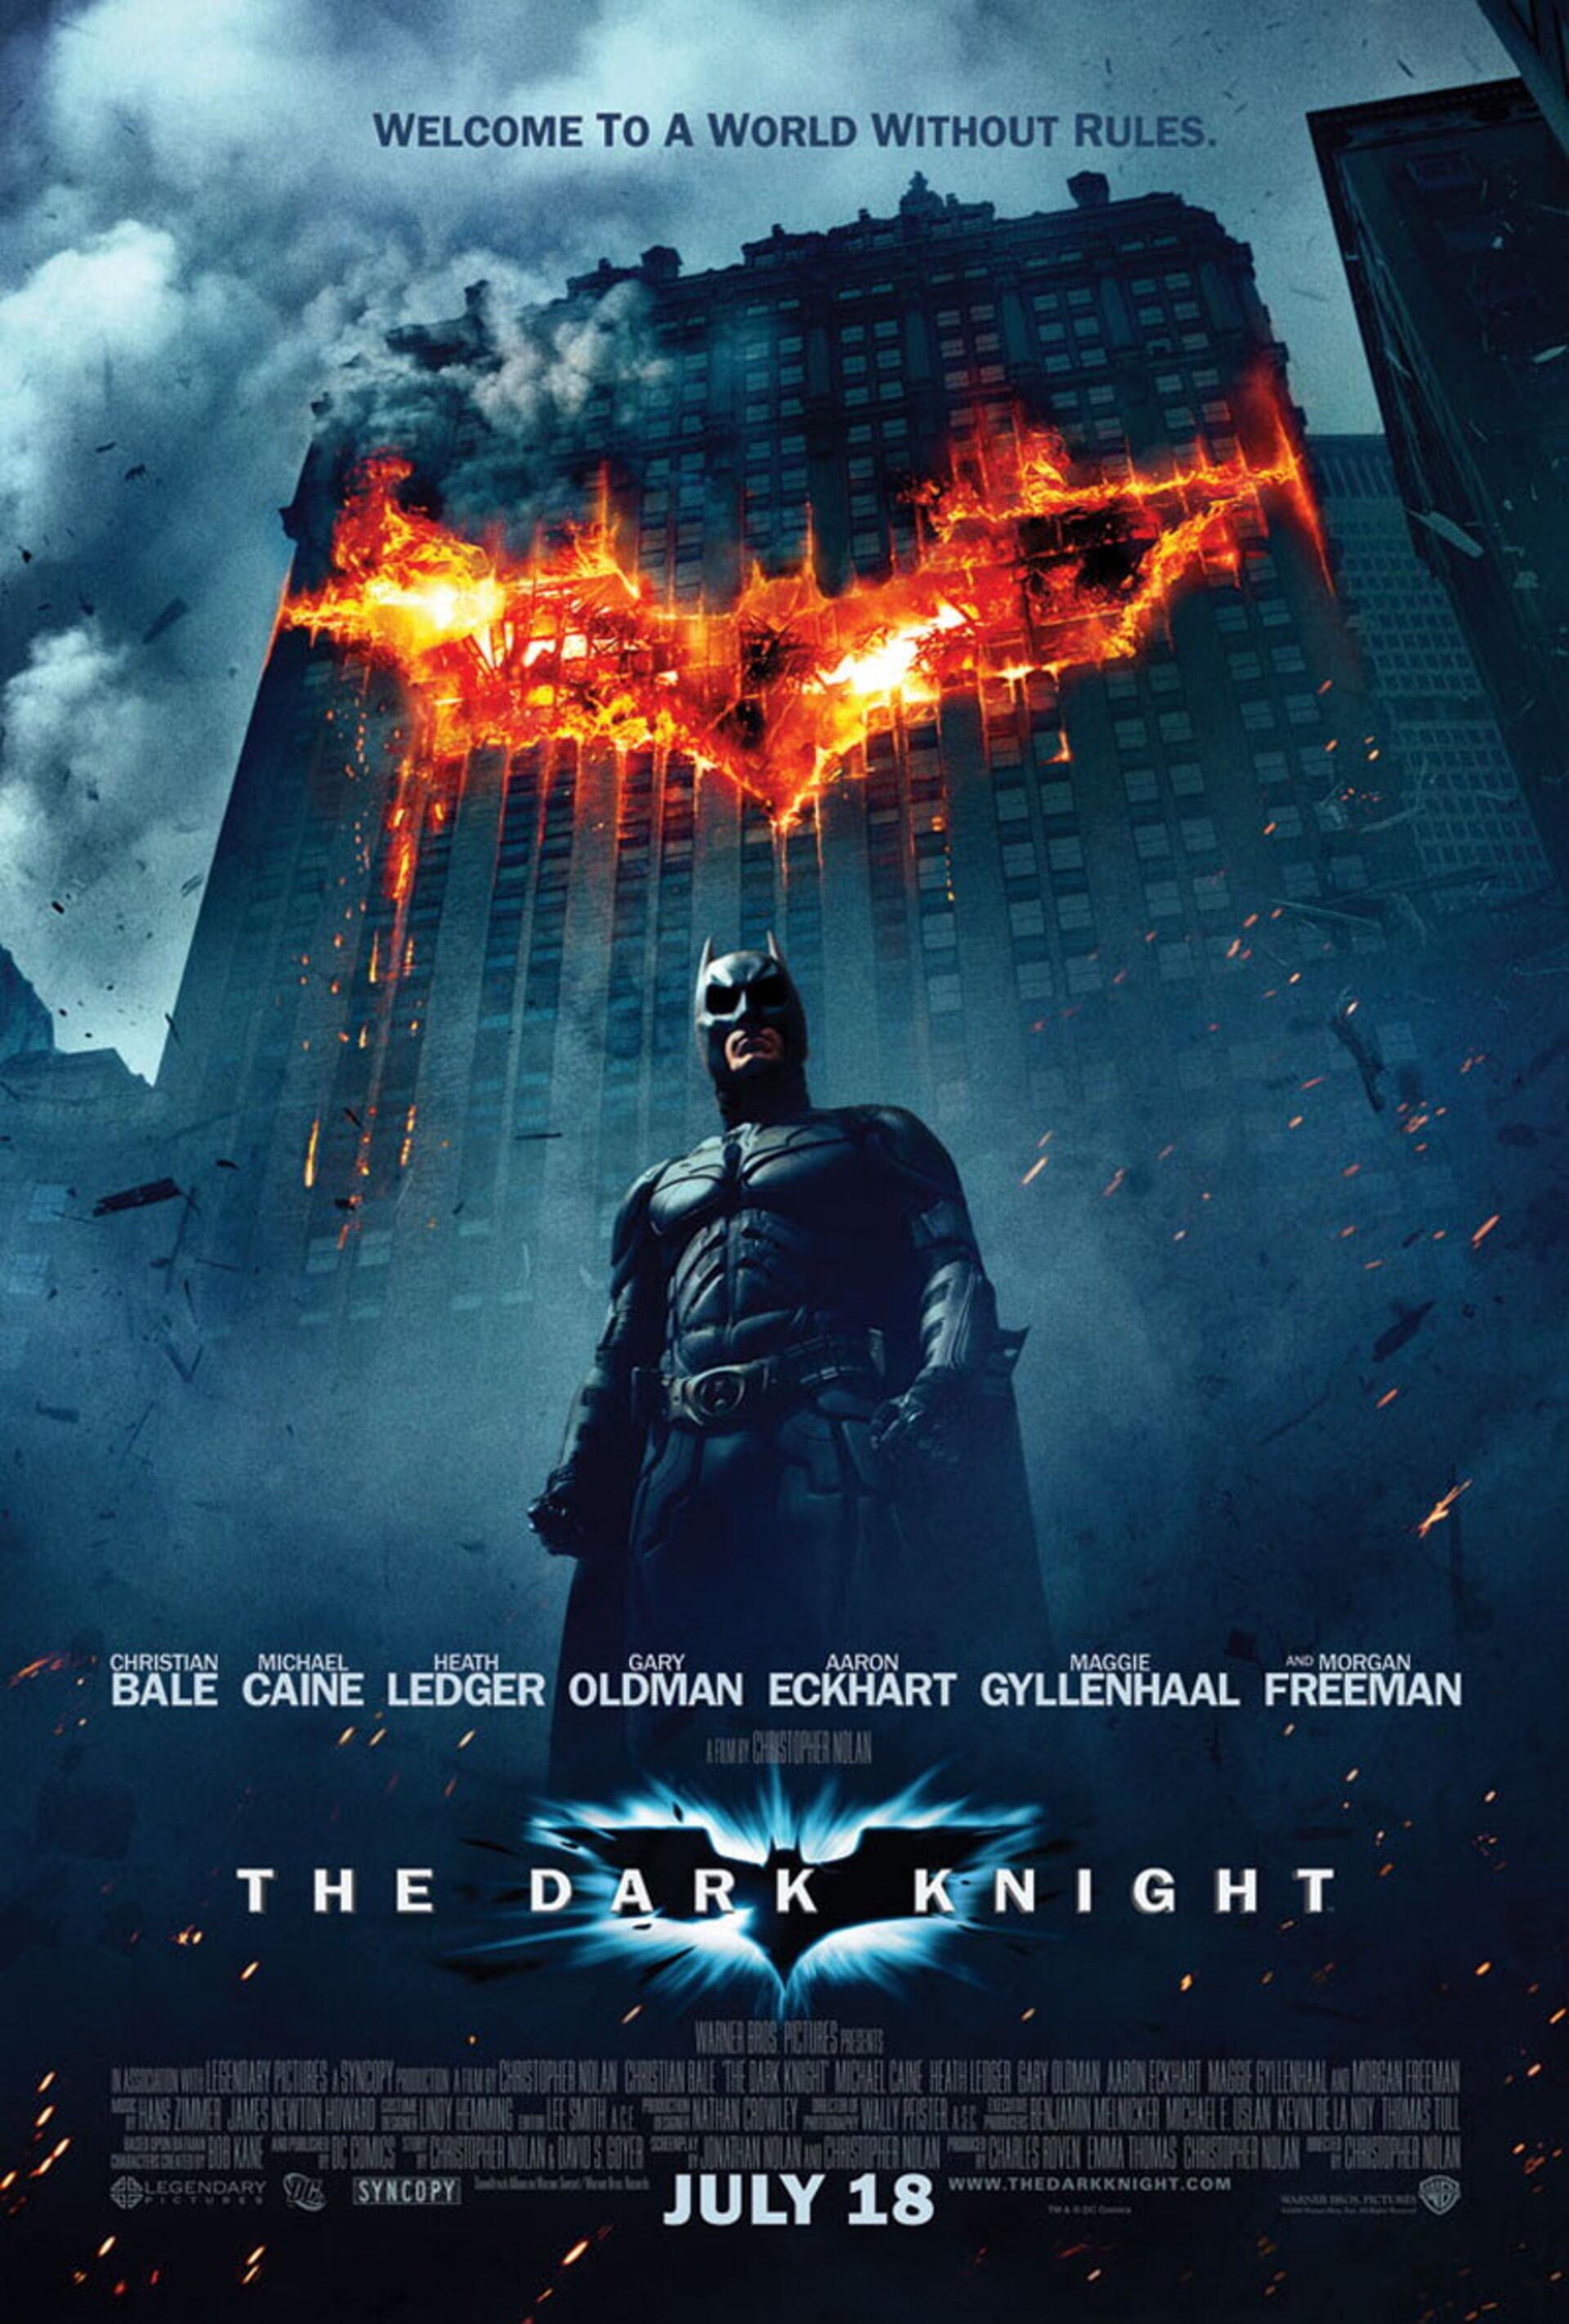 The Dark Knight - Poster 1